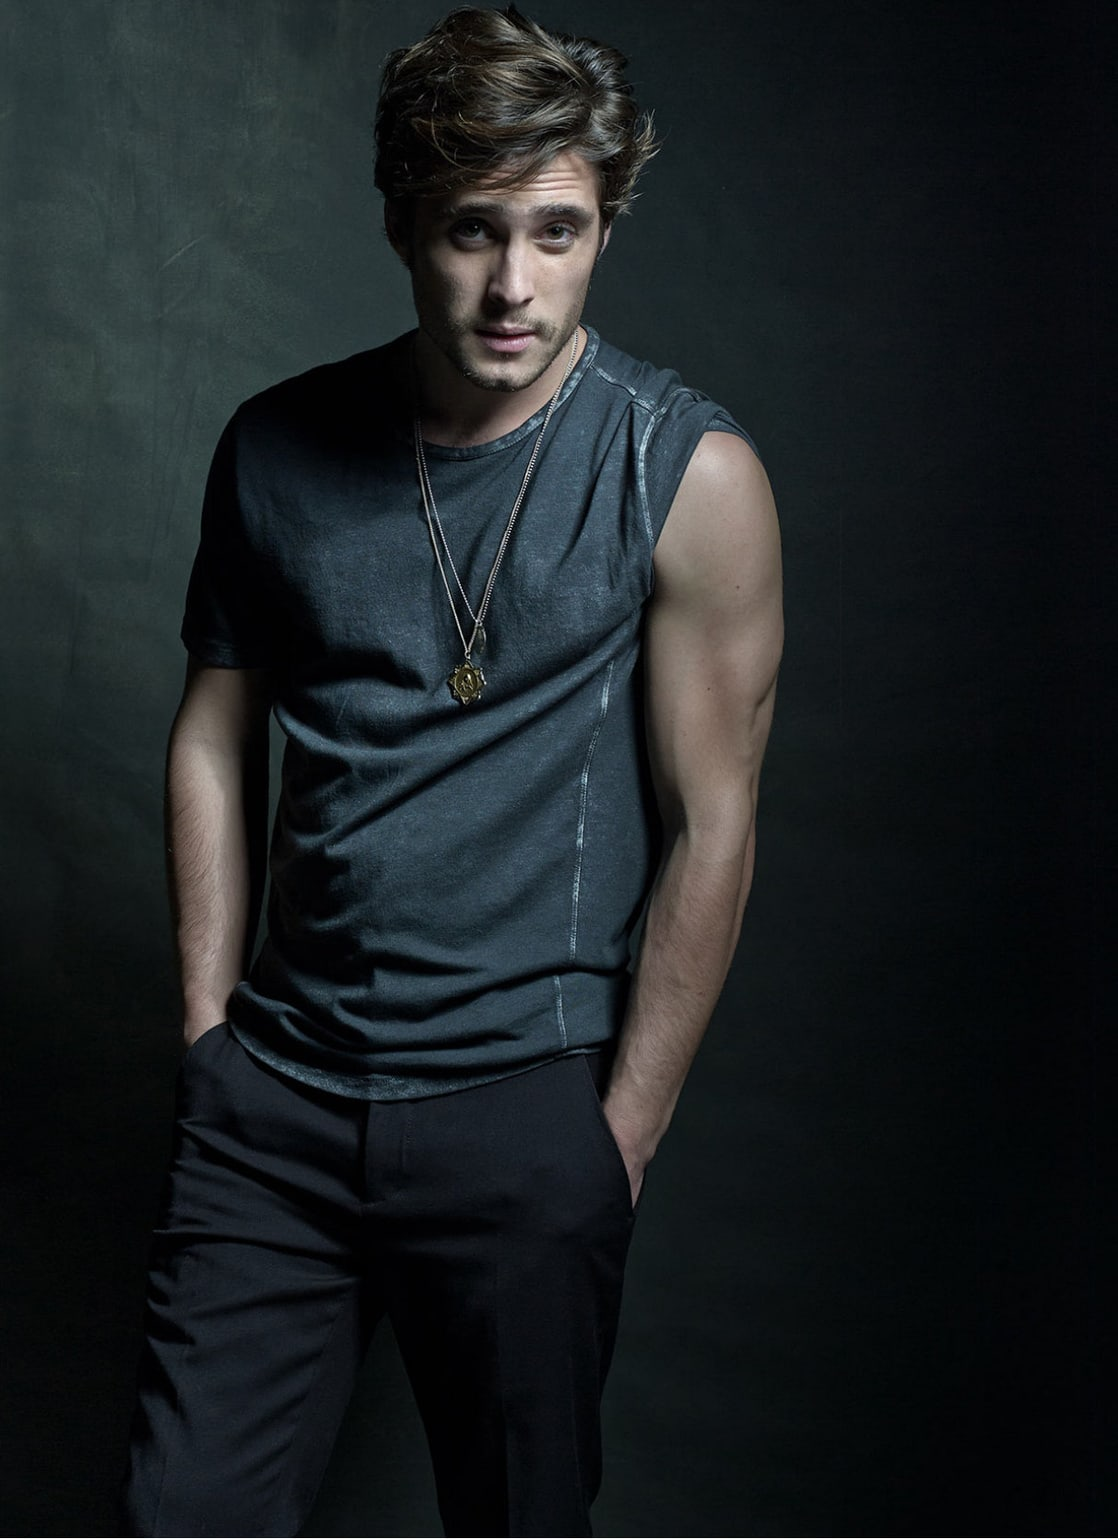 Picture of Diego Boneta